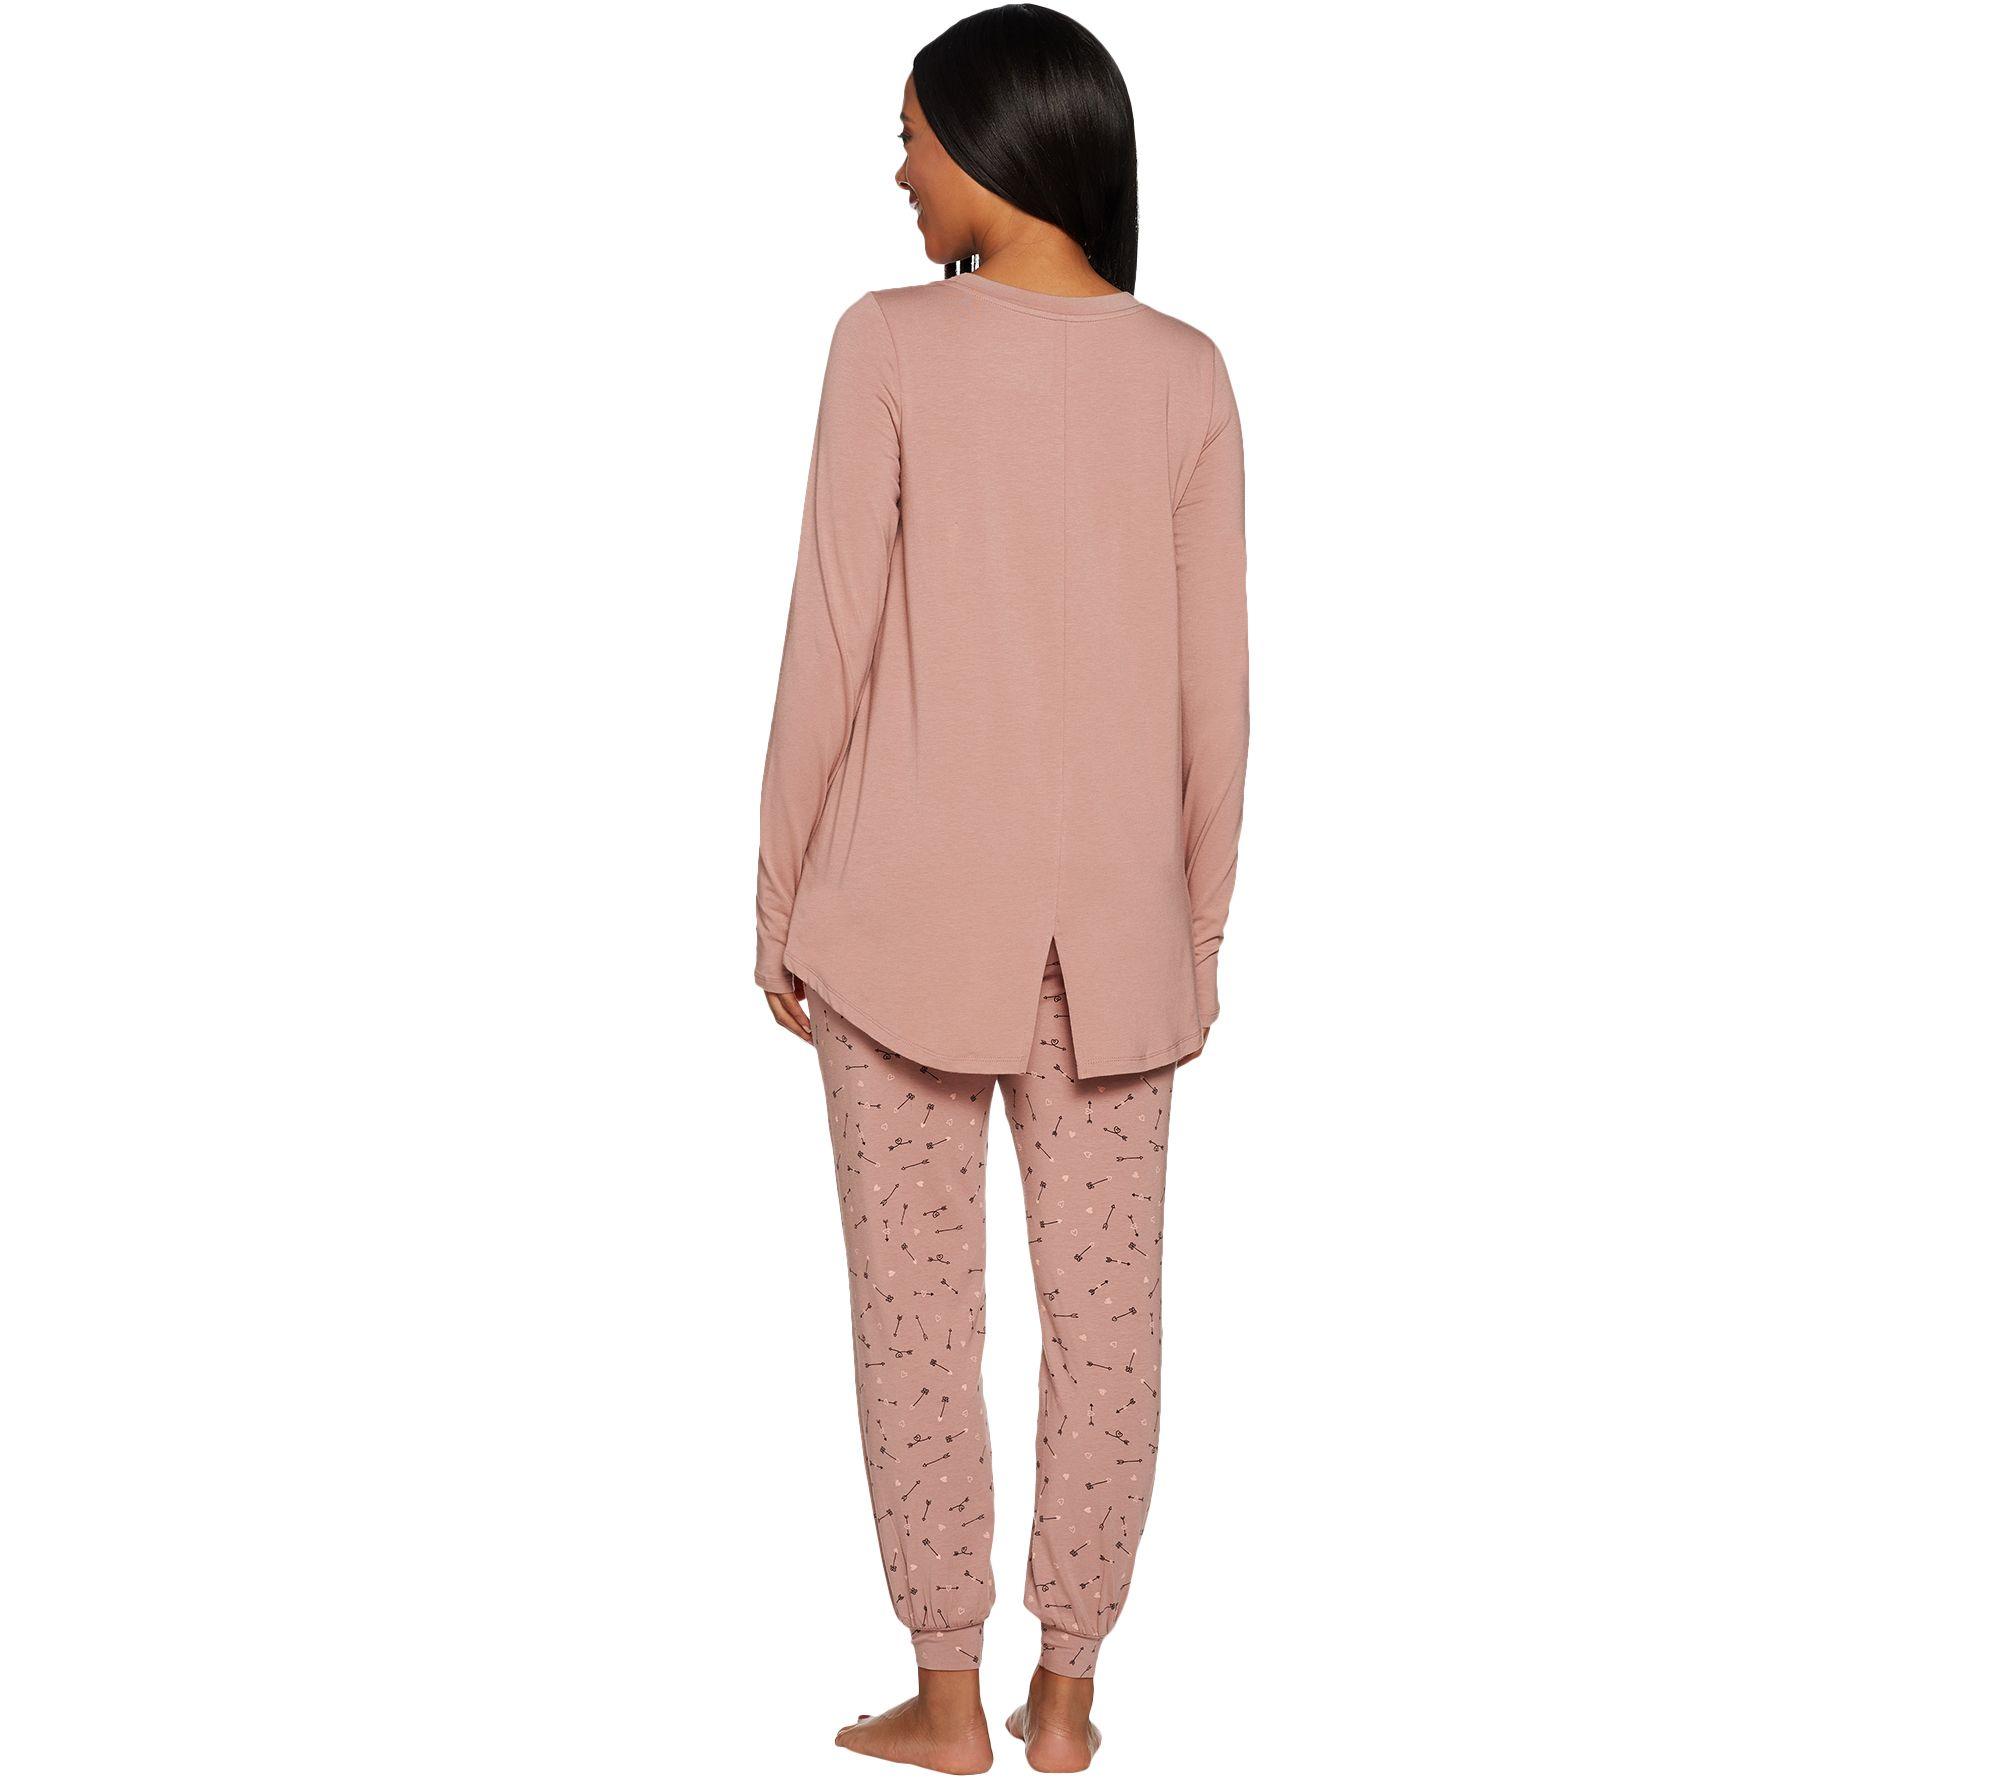 a2dfc0a345 AnyBody Loungewear Petite Cozy Knit Novelty Print PJ Set - Page 1 — QVC.com